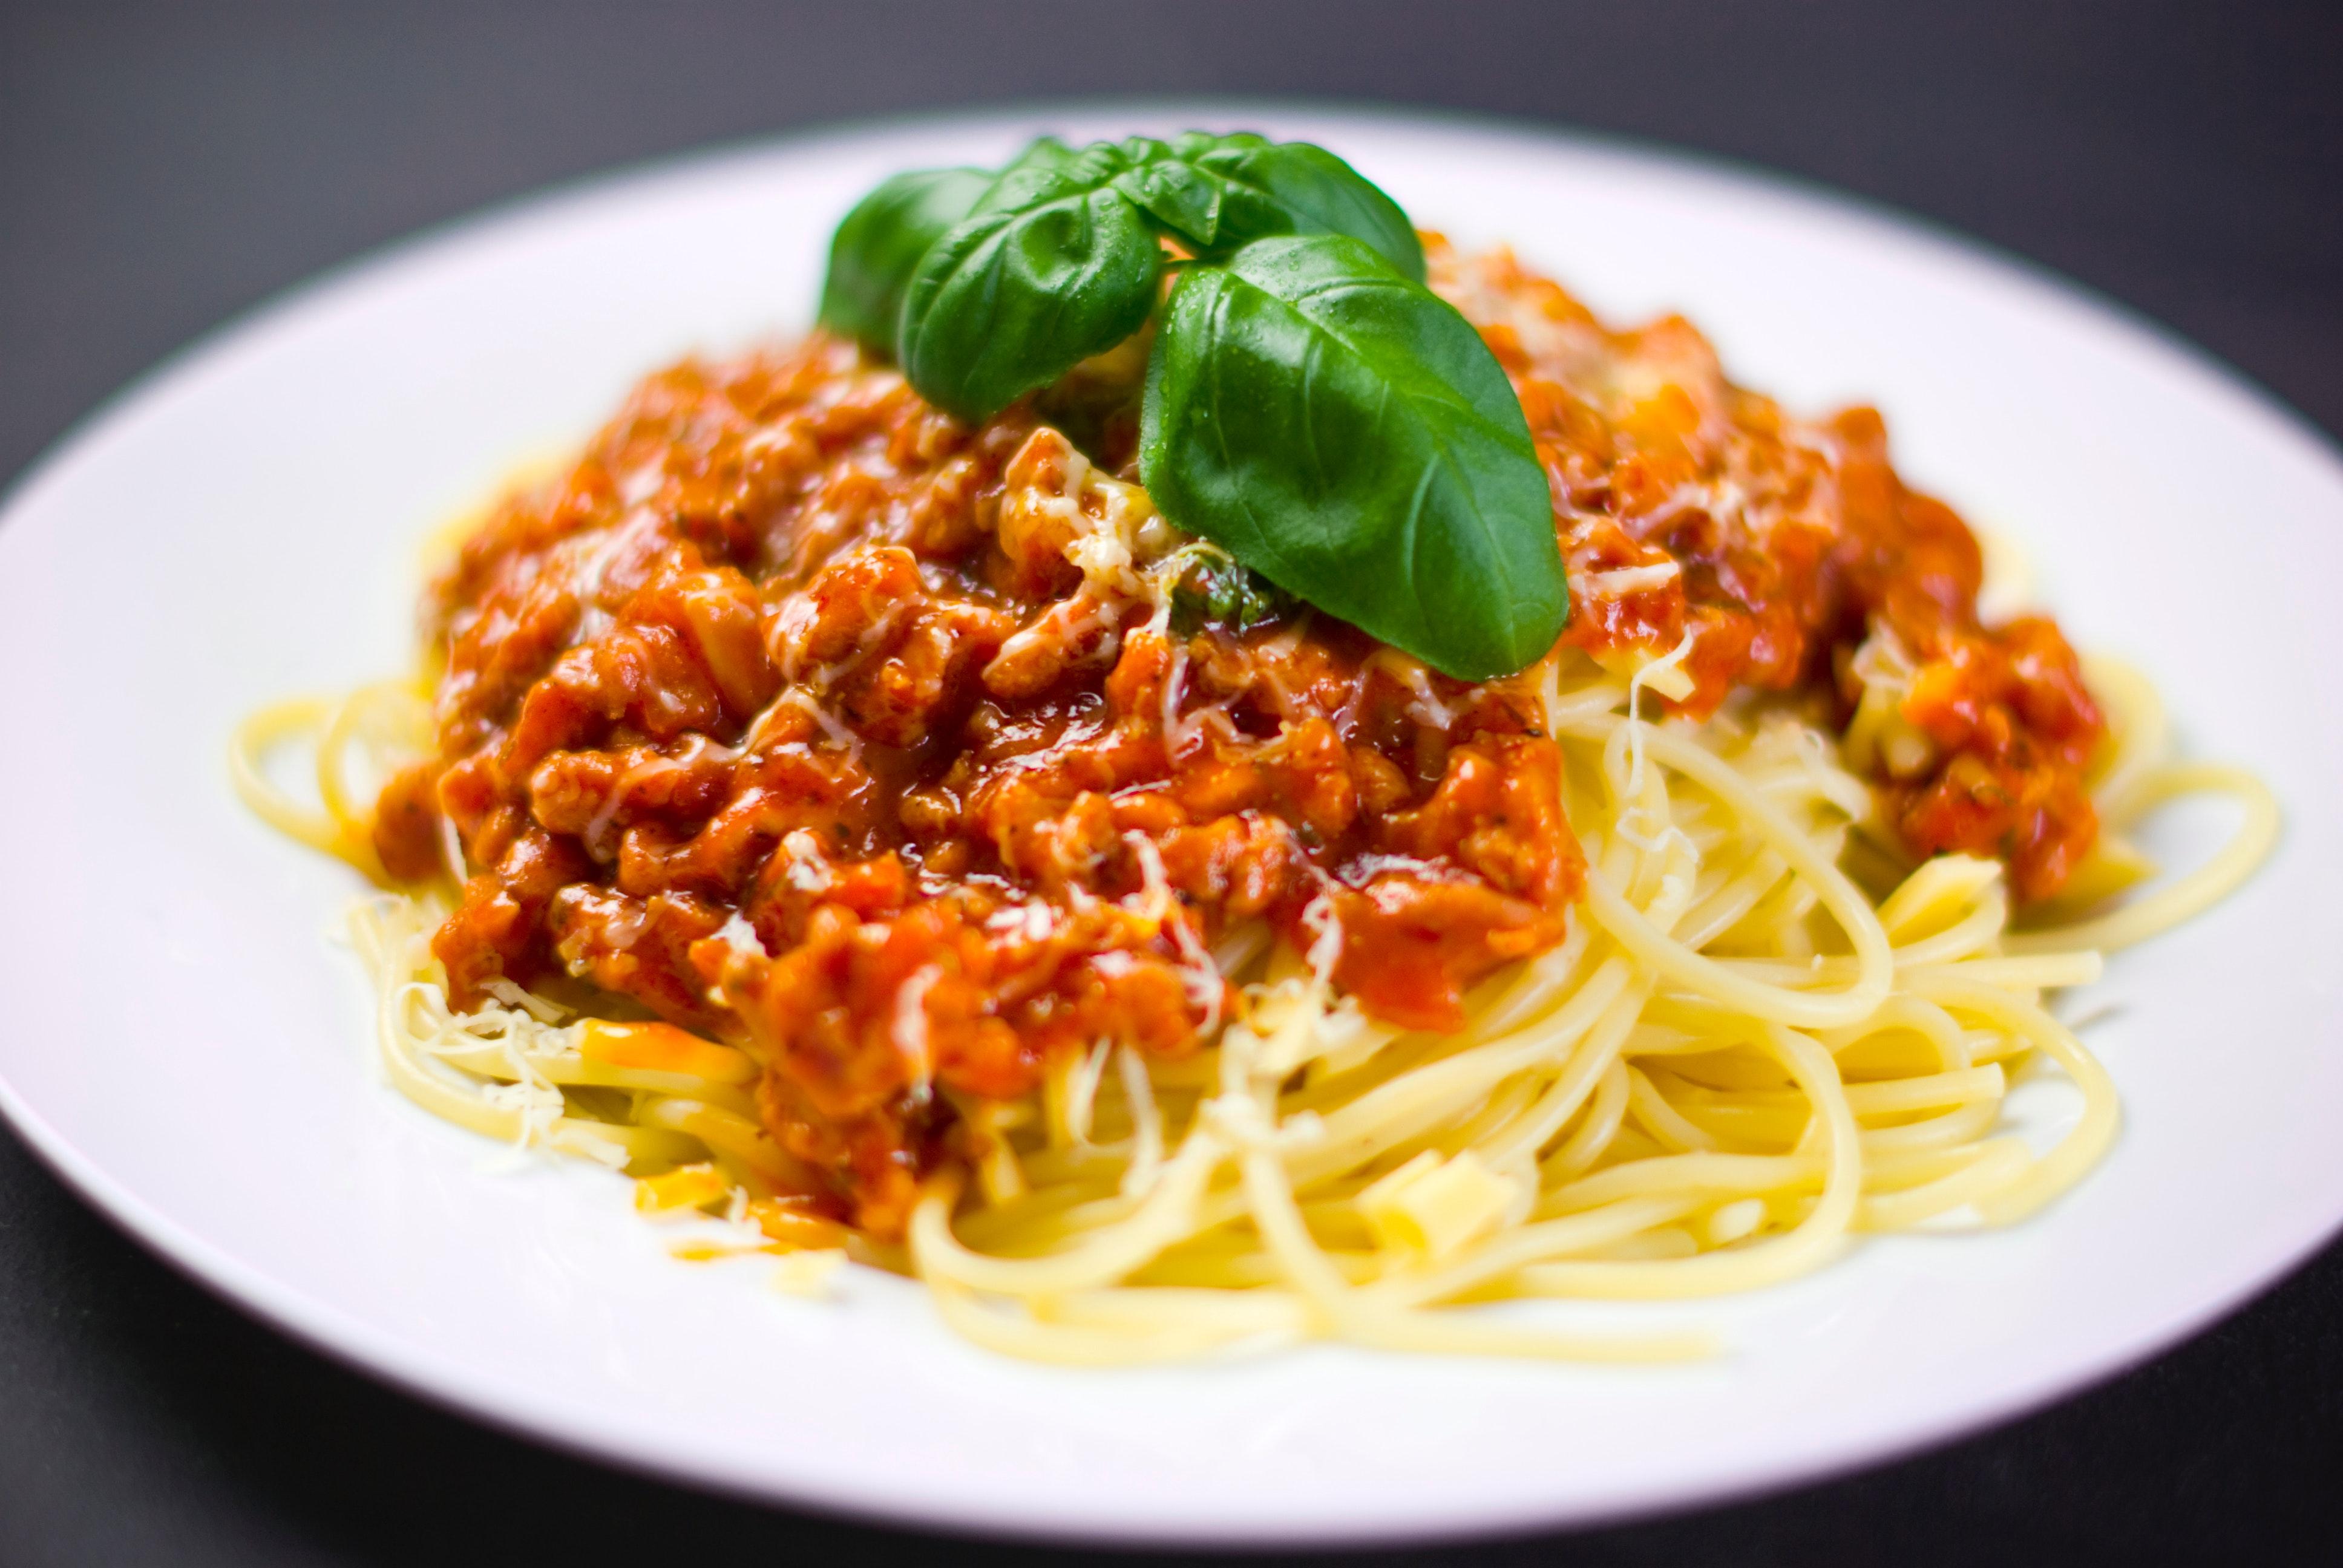 Family Meal Plan spaghetti basil bolognese